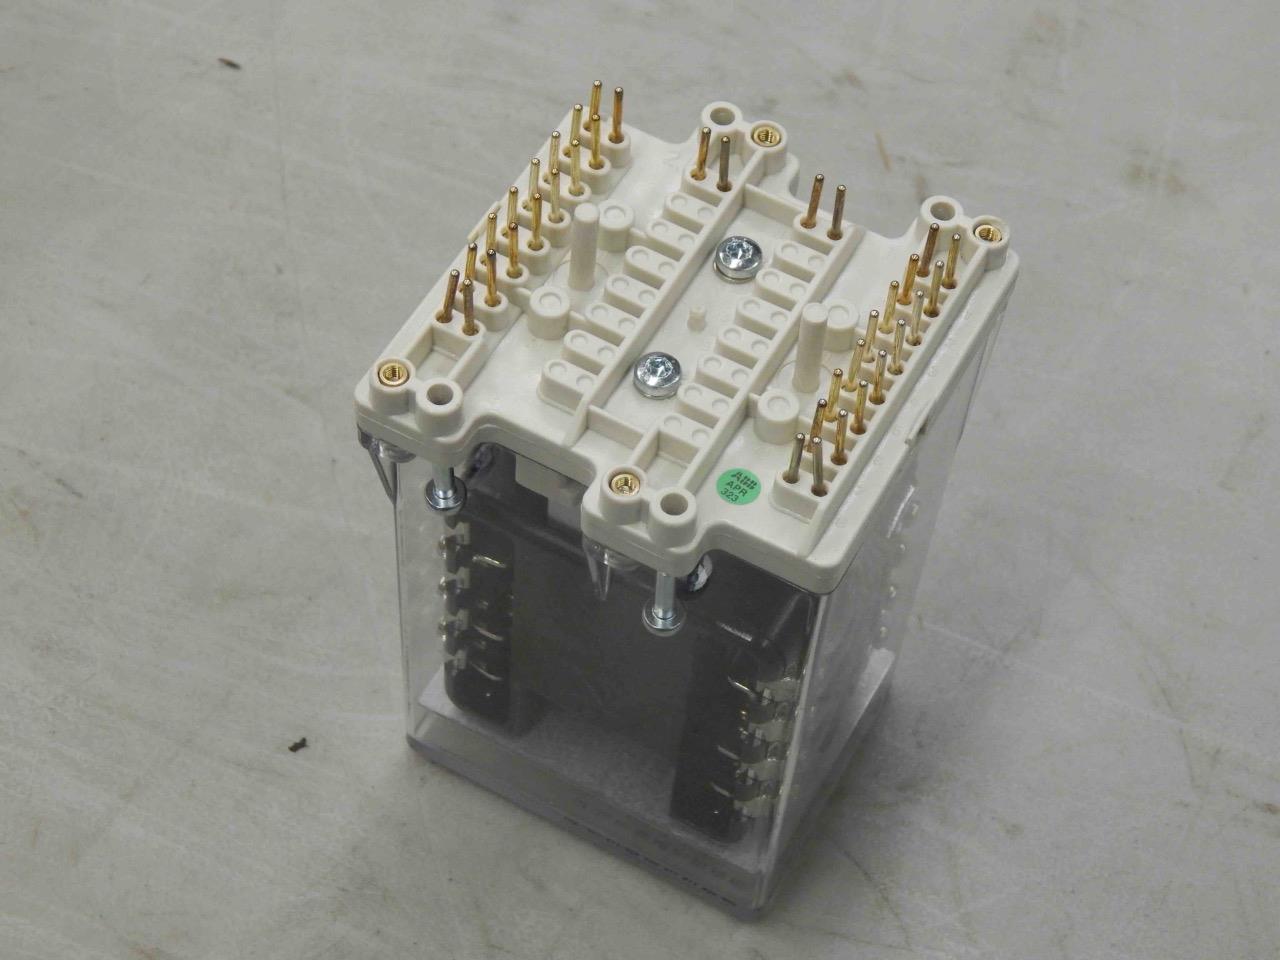 #1084 ABB RK 223 069-AD RXMH 2 Combiflex Relay 24V >NEW ...